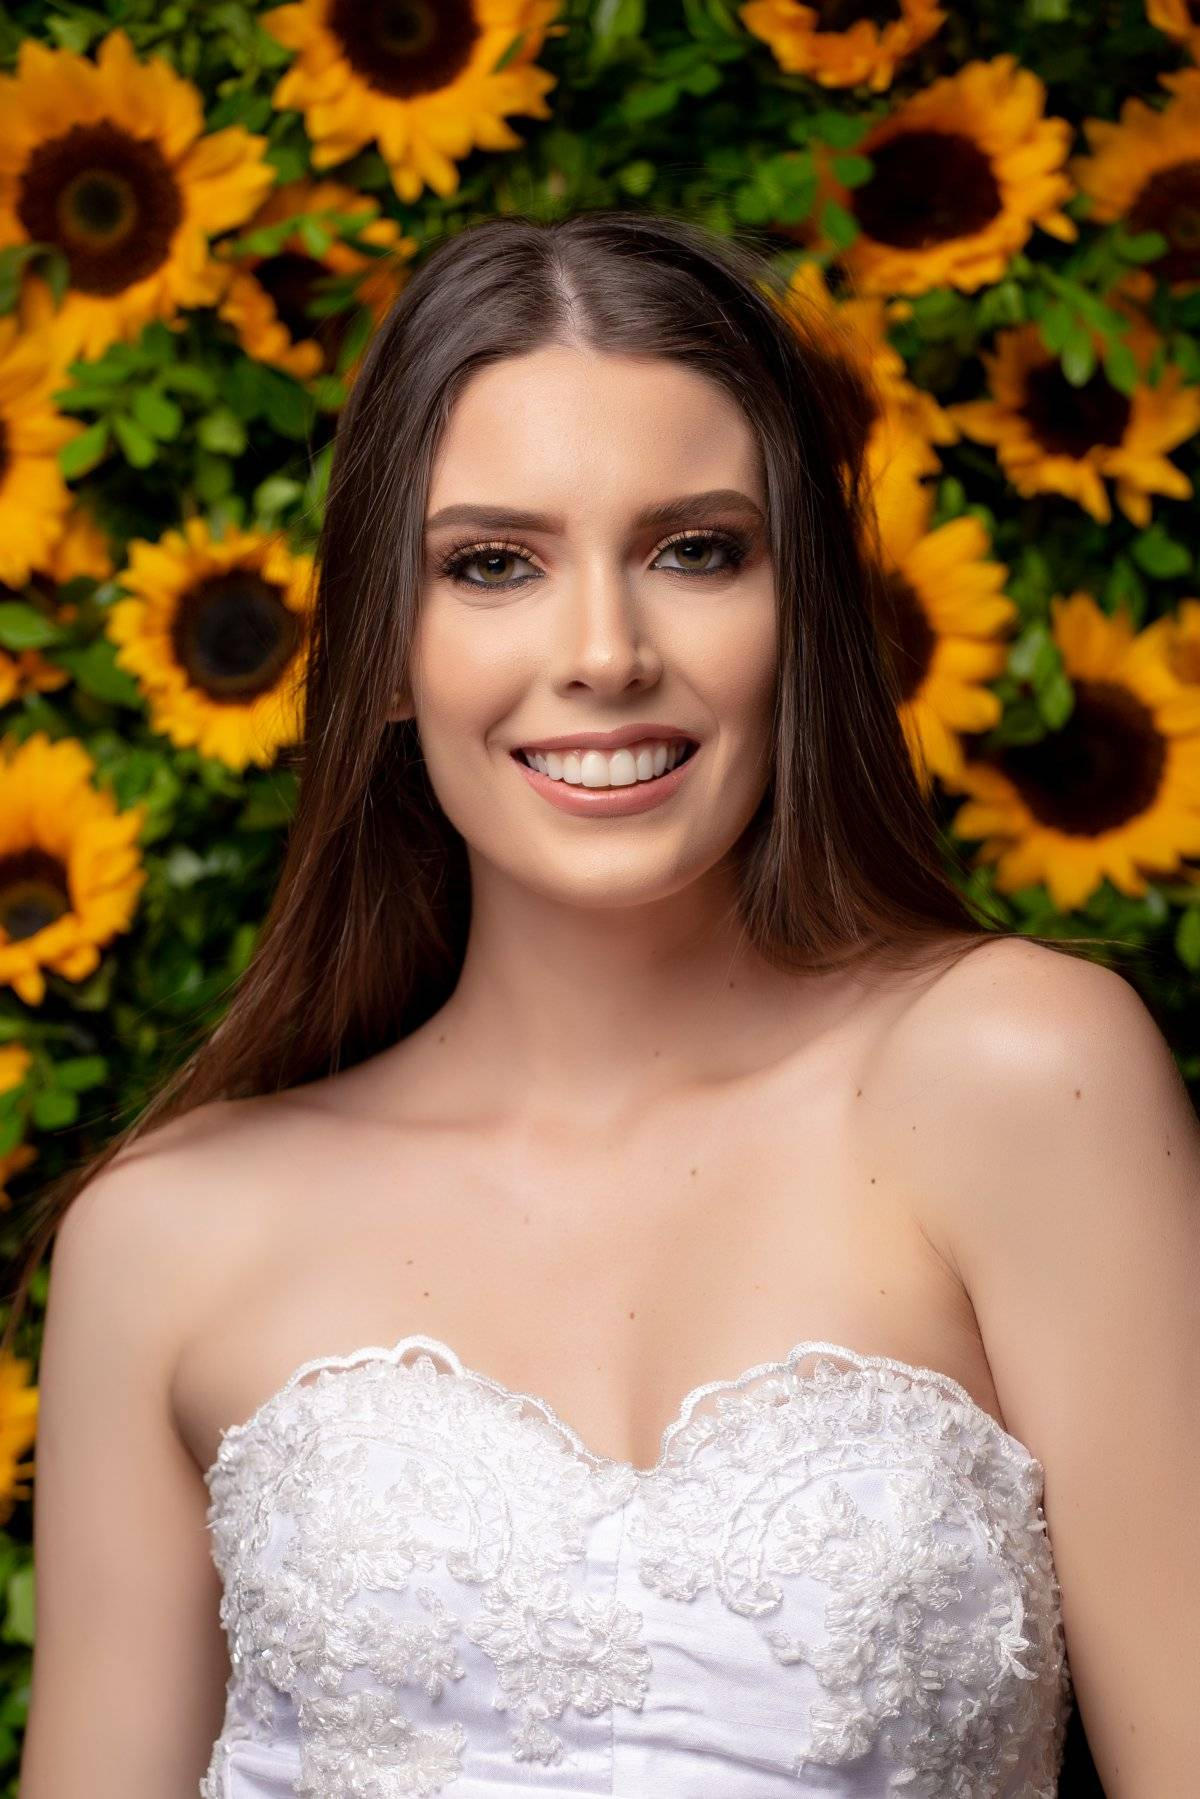 CANDIDATAS A MISS ECUADOR 2019.  FINAL 19 DE JULIO - Página 2 19cristinahidalgoguayaquil-c964b1a9ab6bd287469f13e68c8d632e-1200x0